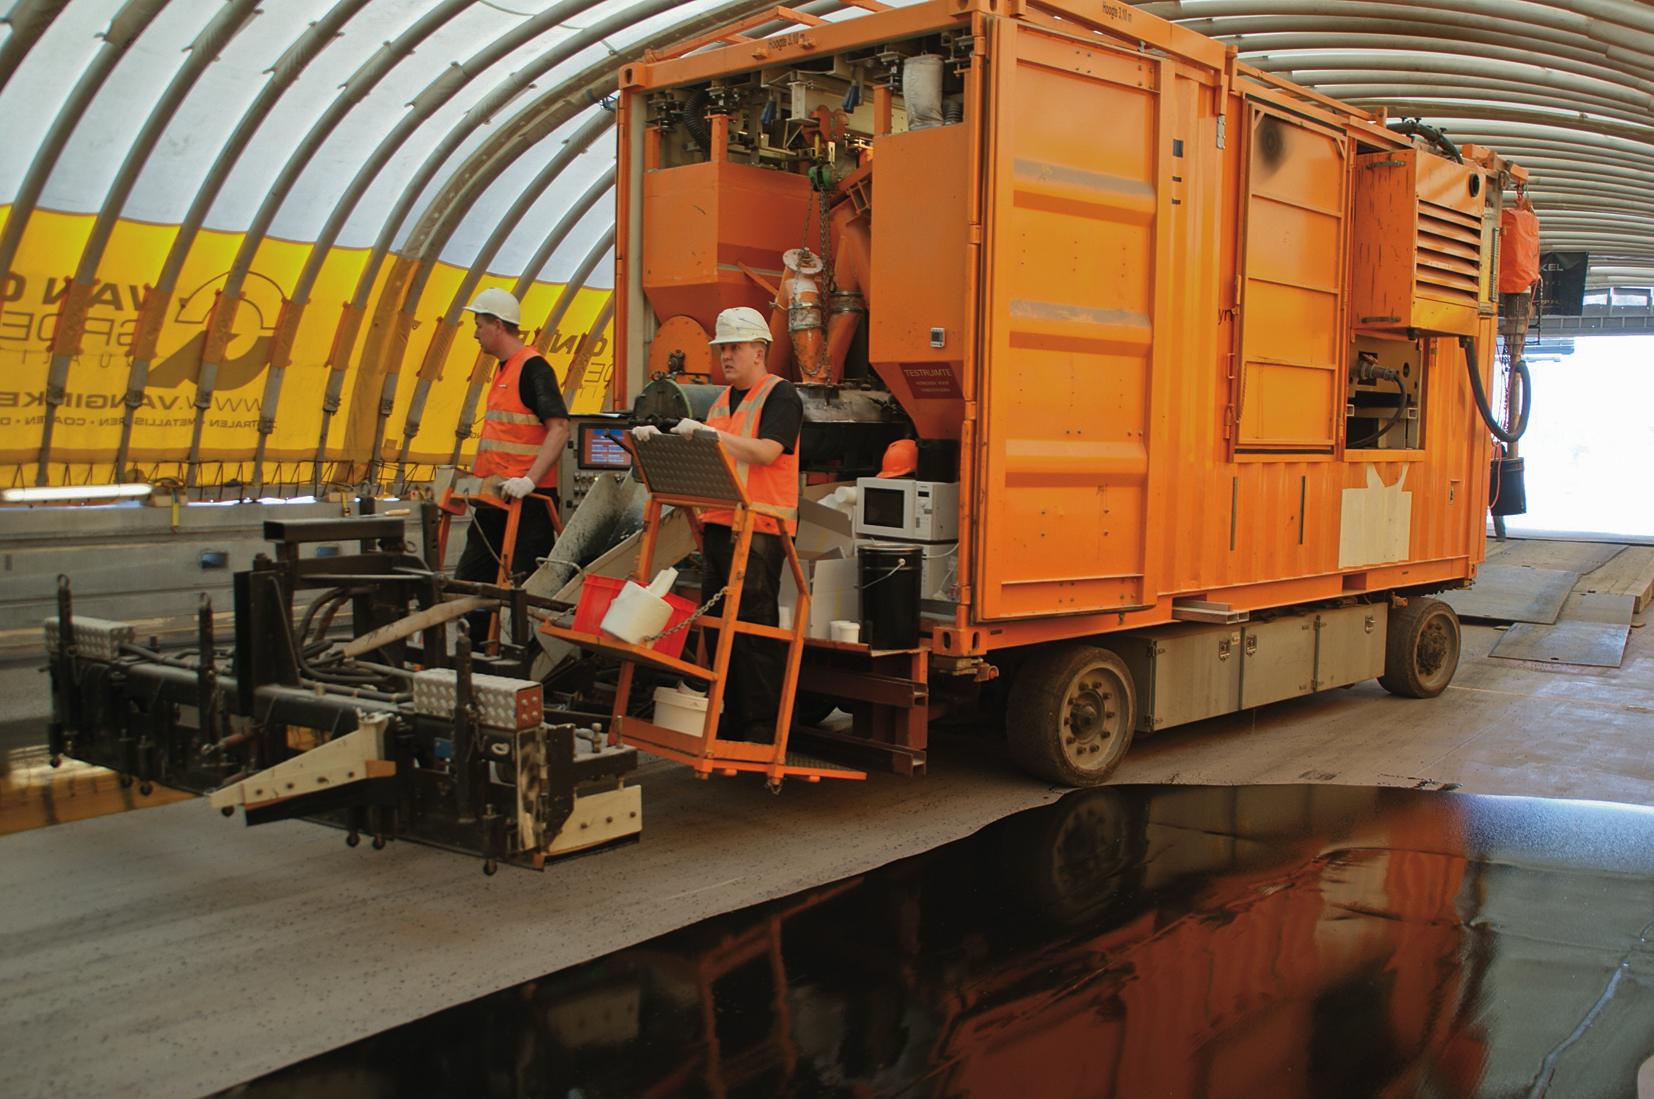 Oranjewagen